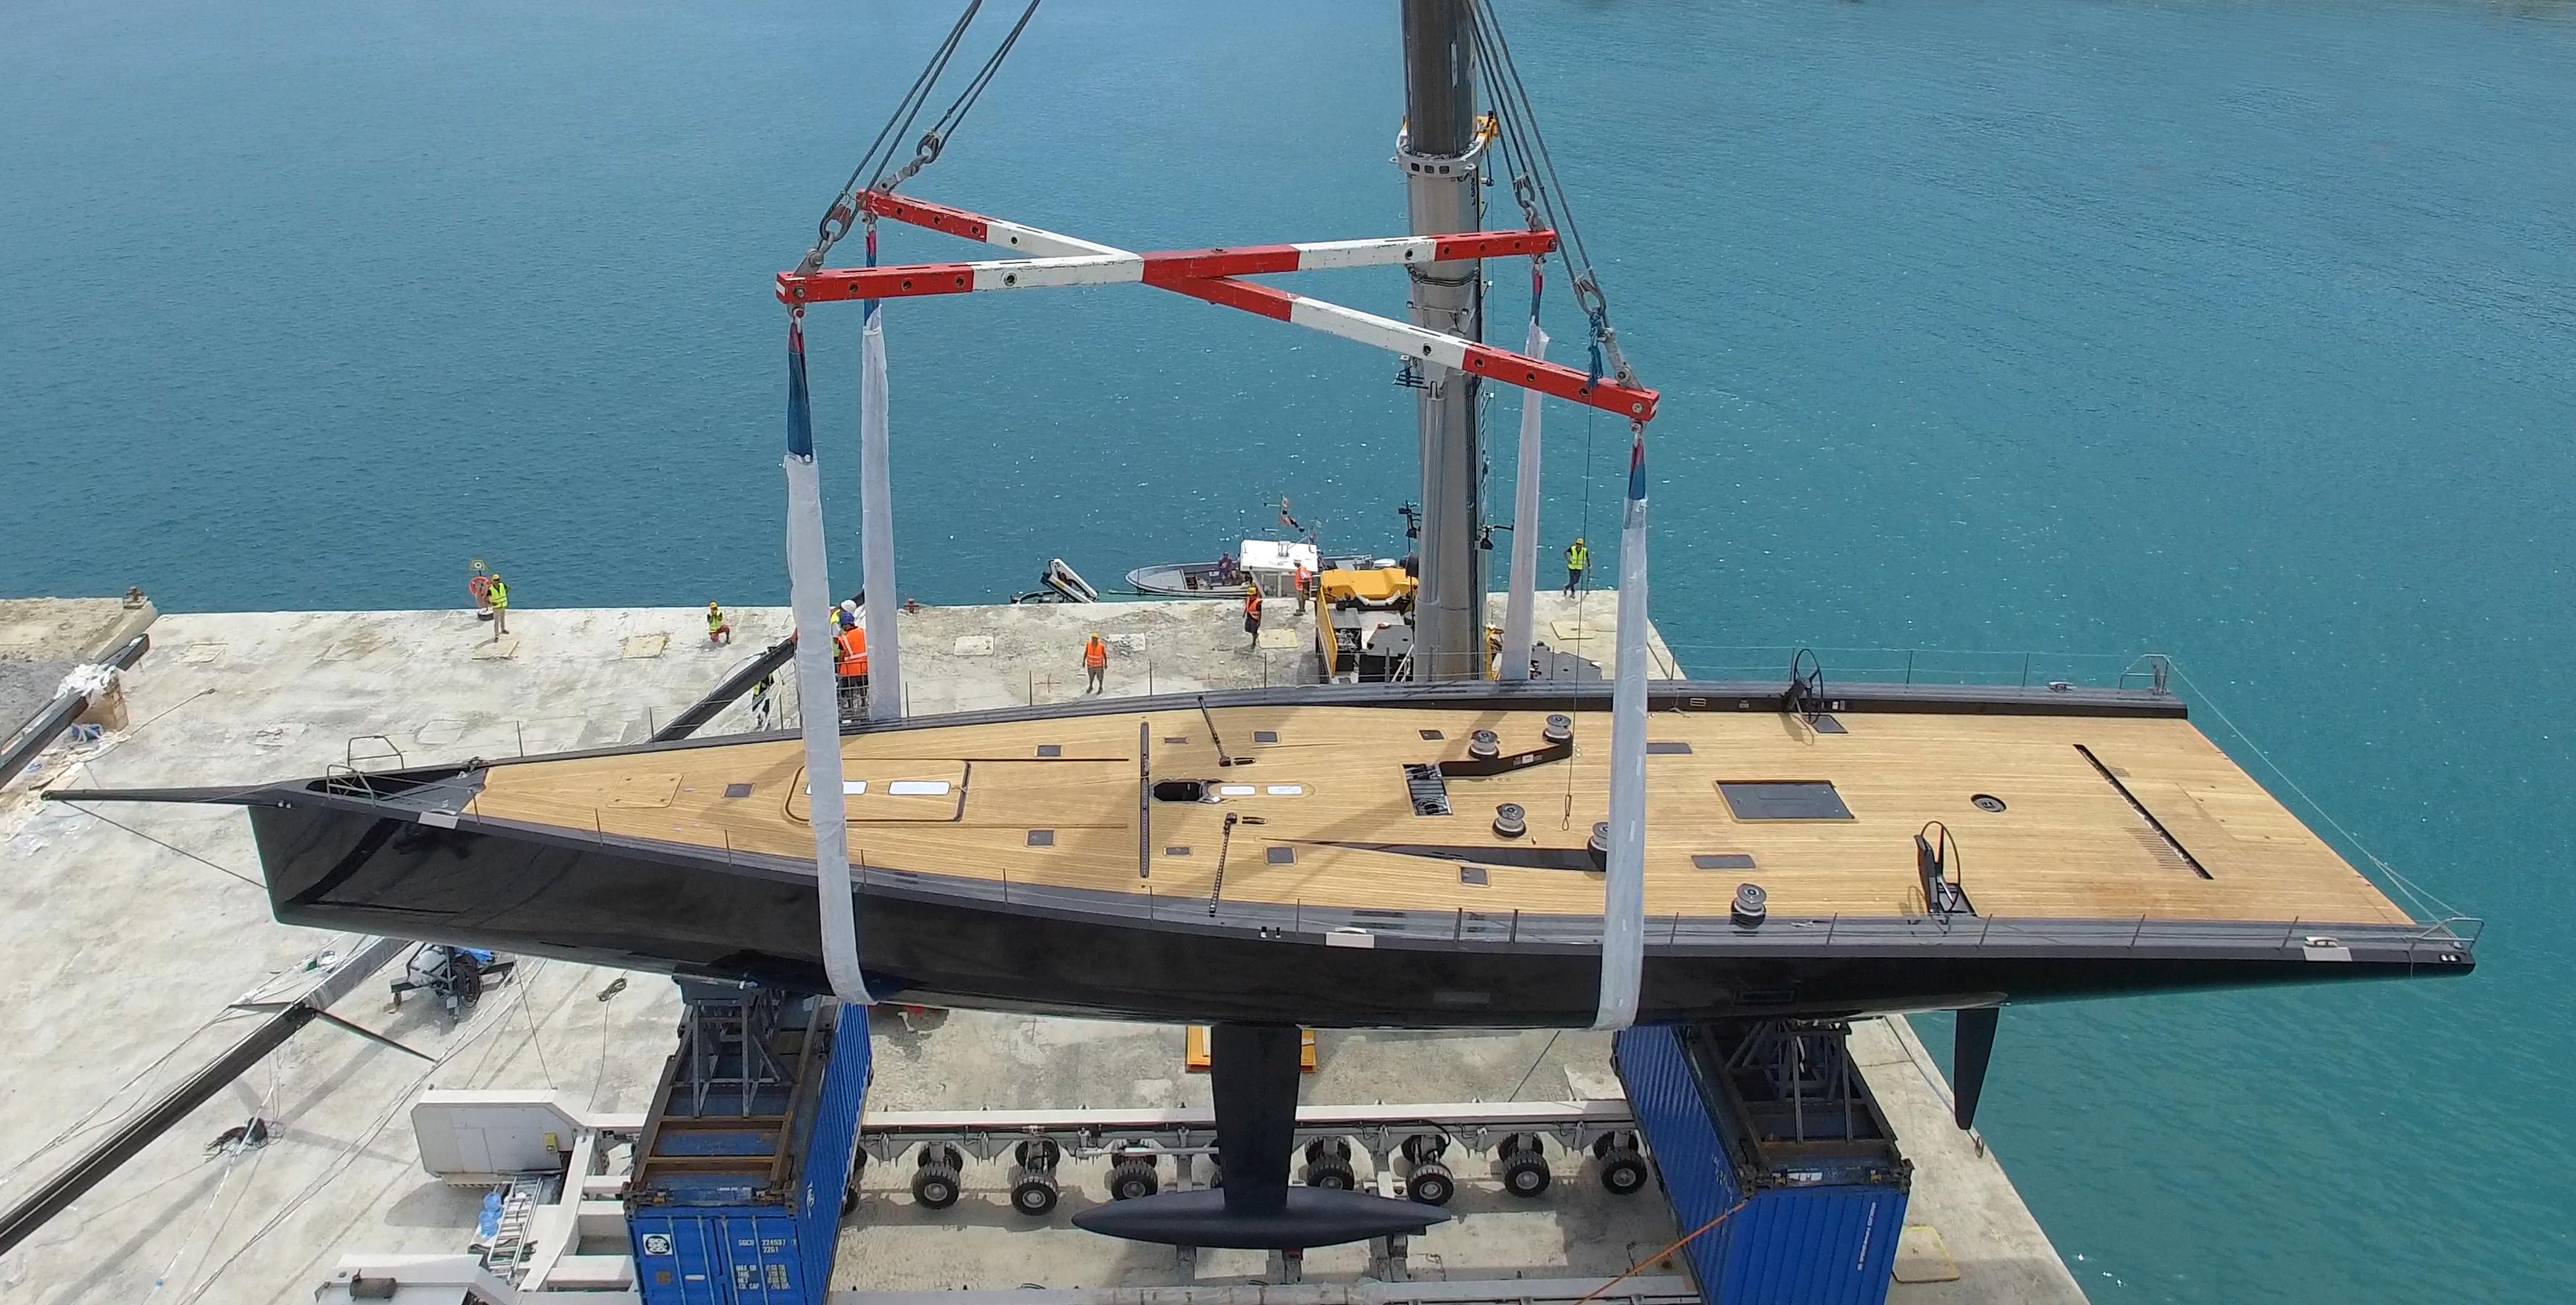 30m/98ft sailing yacht TANGO preparing for launch. Photo credit - Virgilio Fidanza